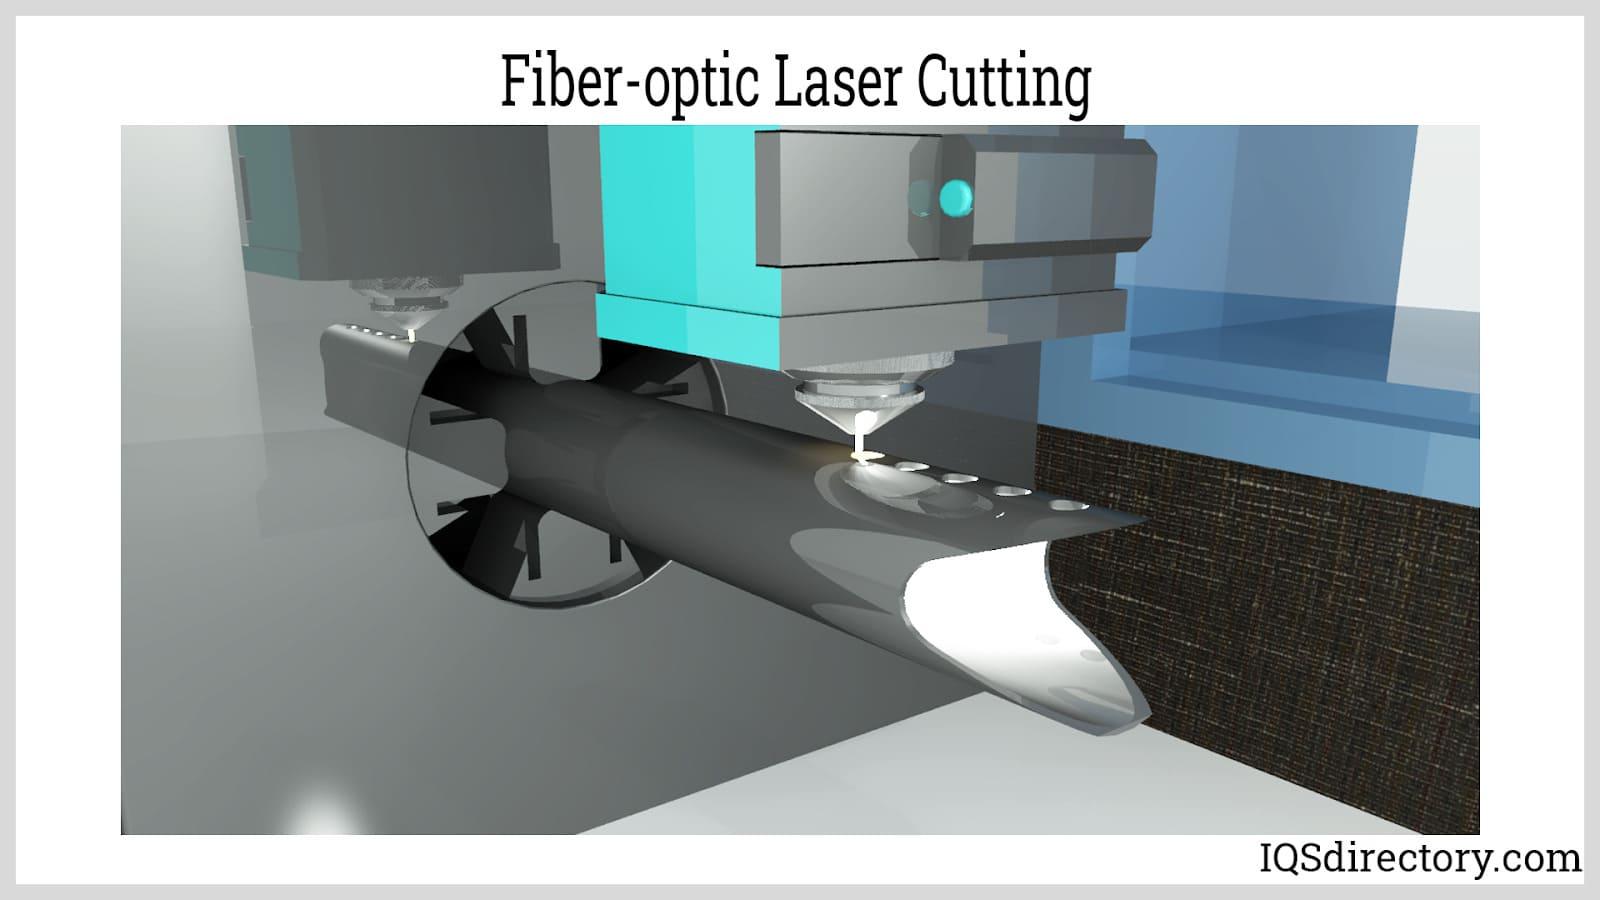 Fiber-optic Laser Cutting